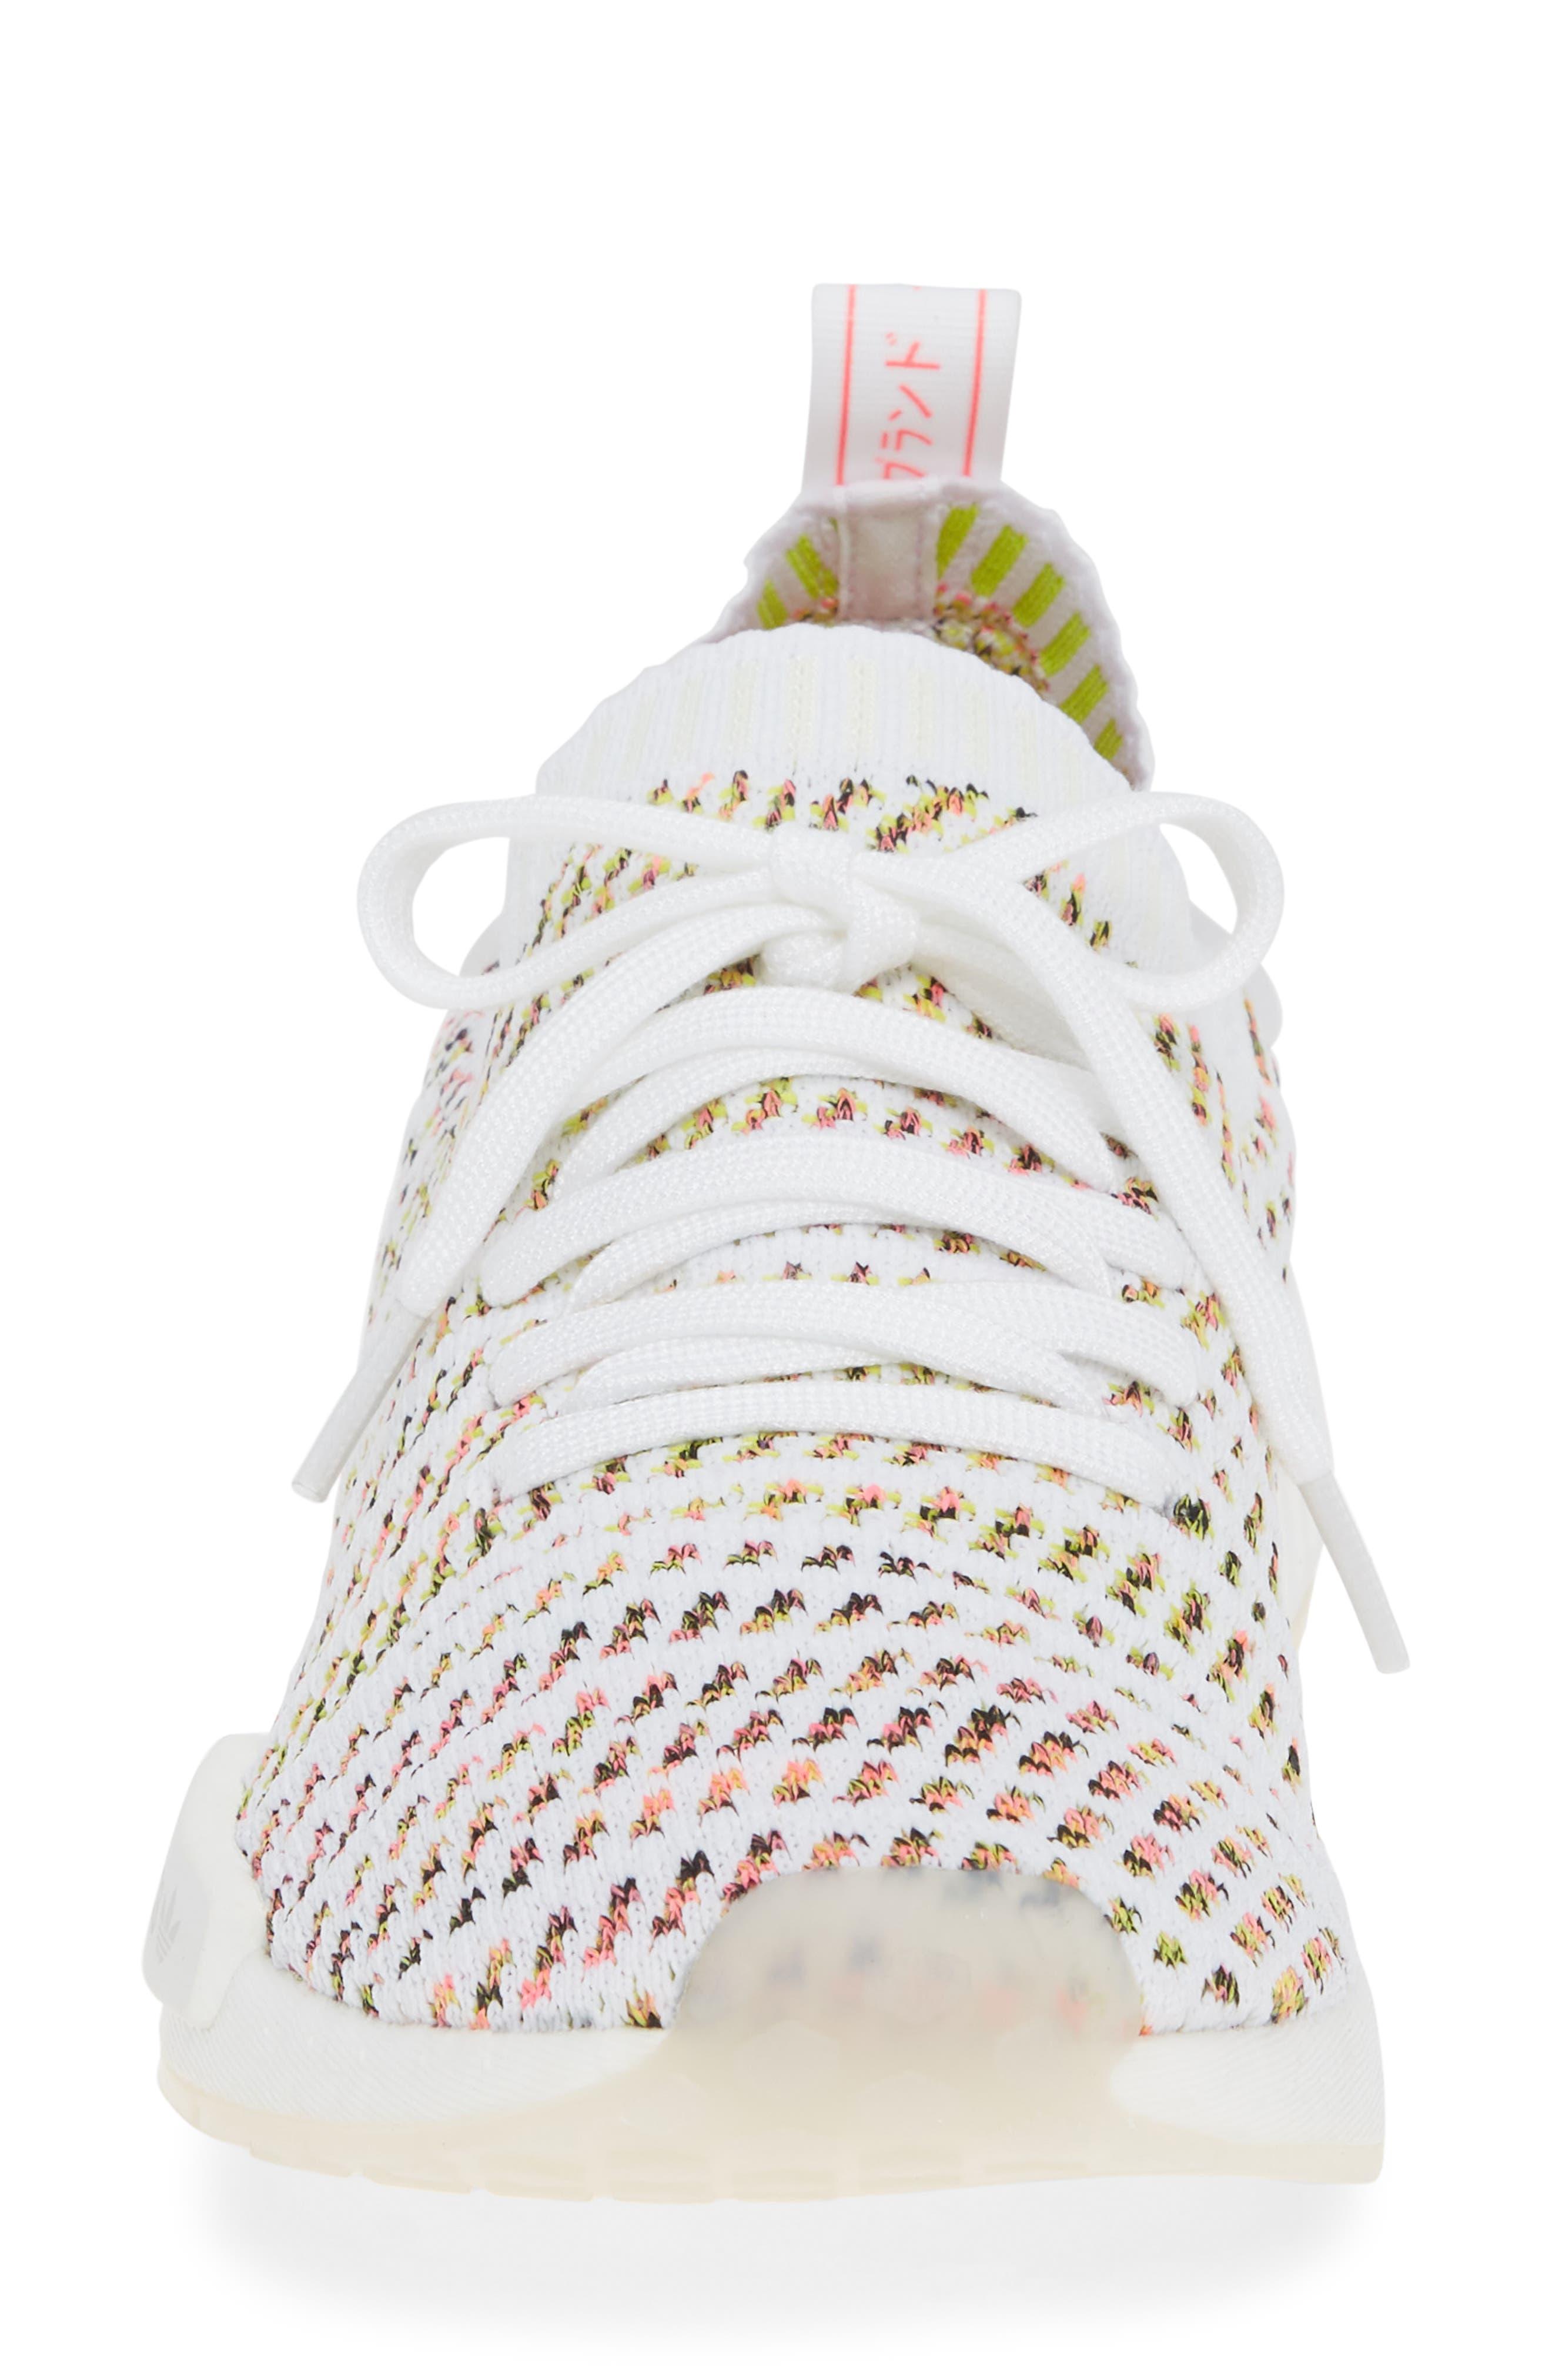 NMD R1 STLT Primeknit Sneaker,                             Alternate thumbnail 4, color,                             WHITE/ YELLOW/ SOLAR PINK